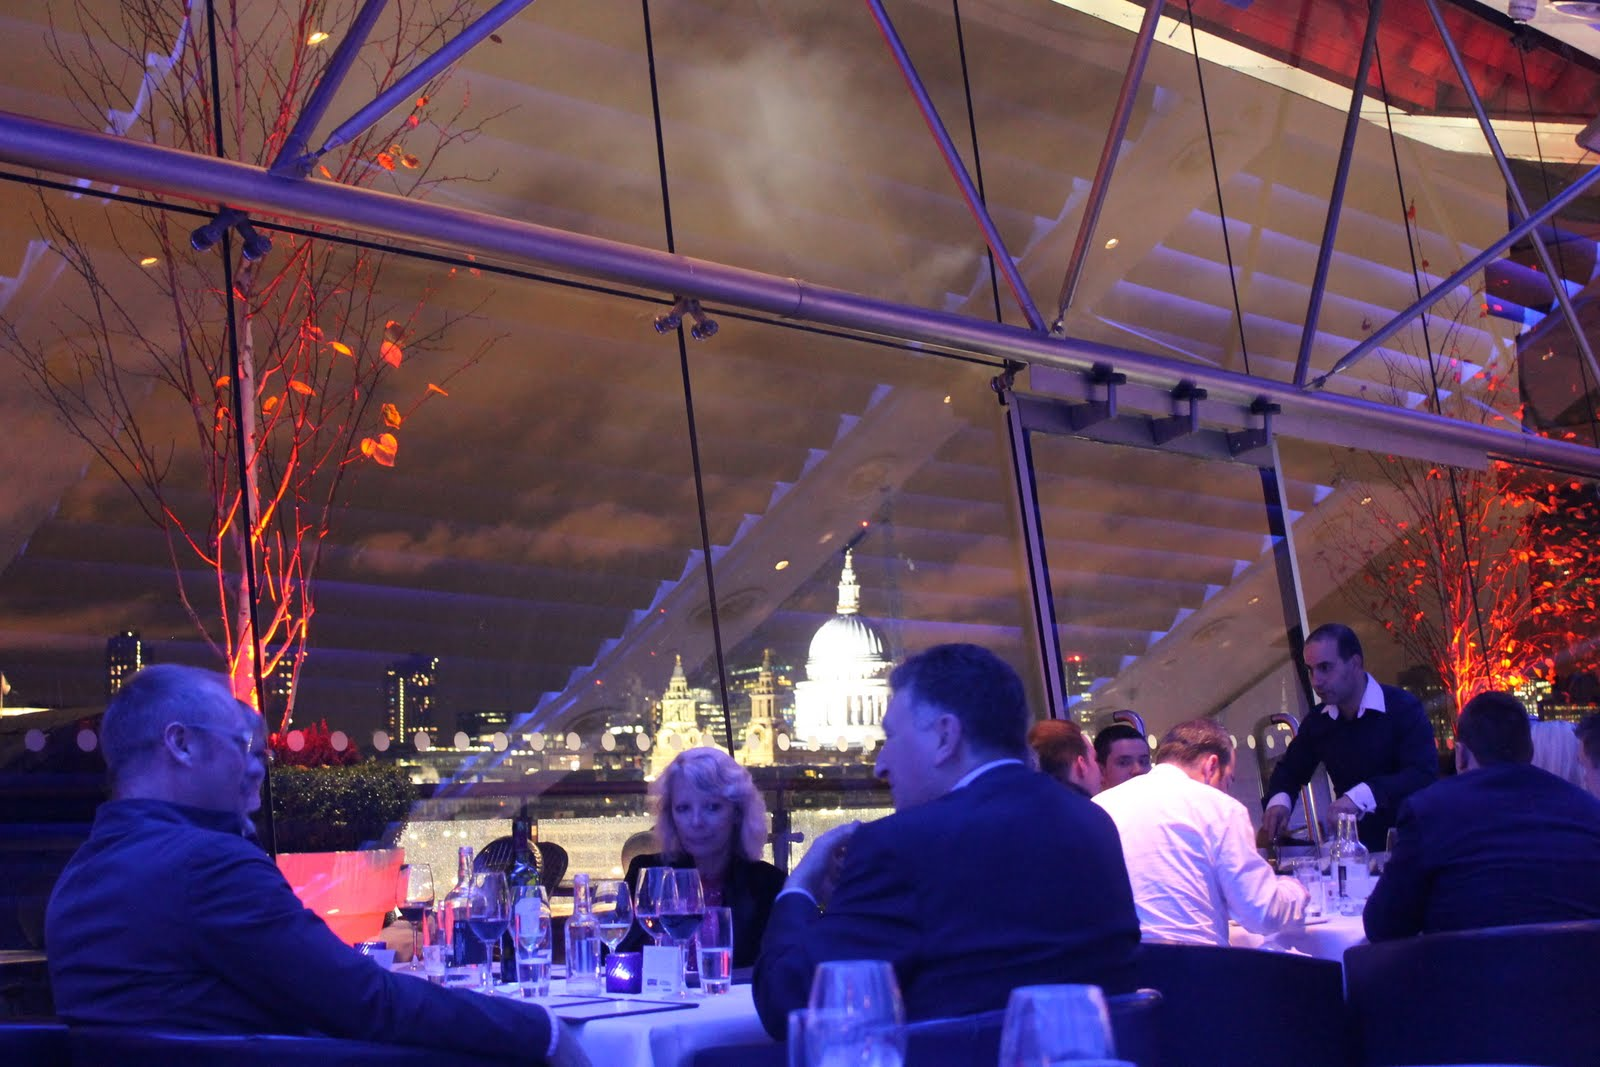 Oxo Tower Restaurant Michelin Star